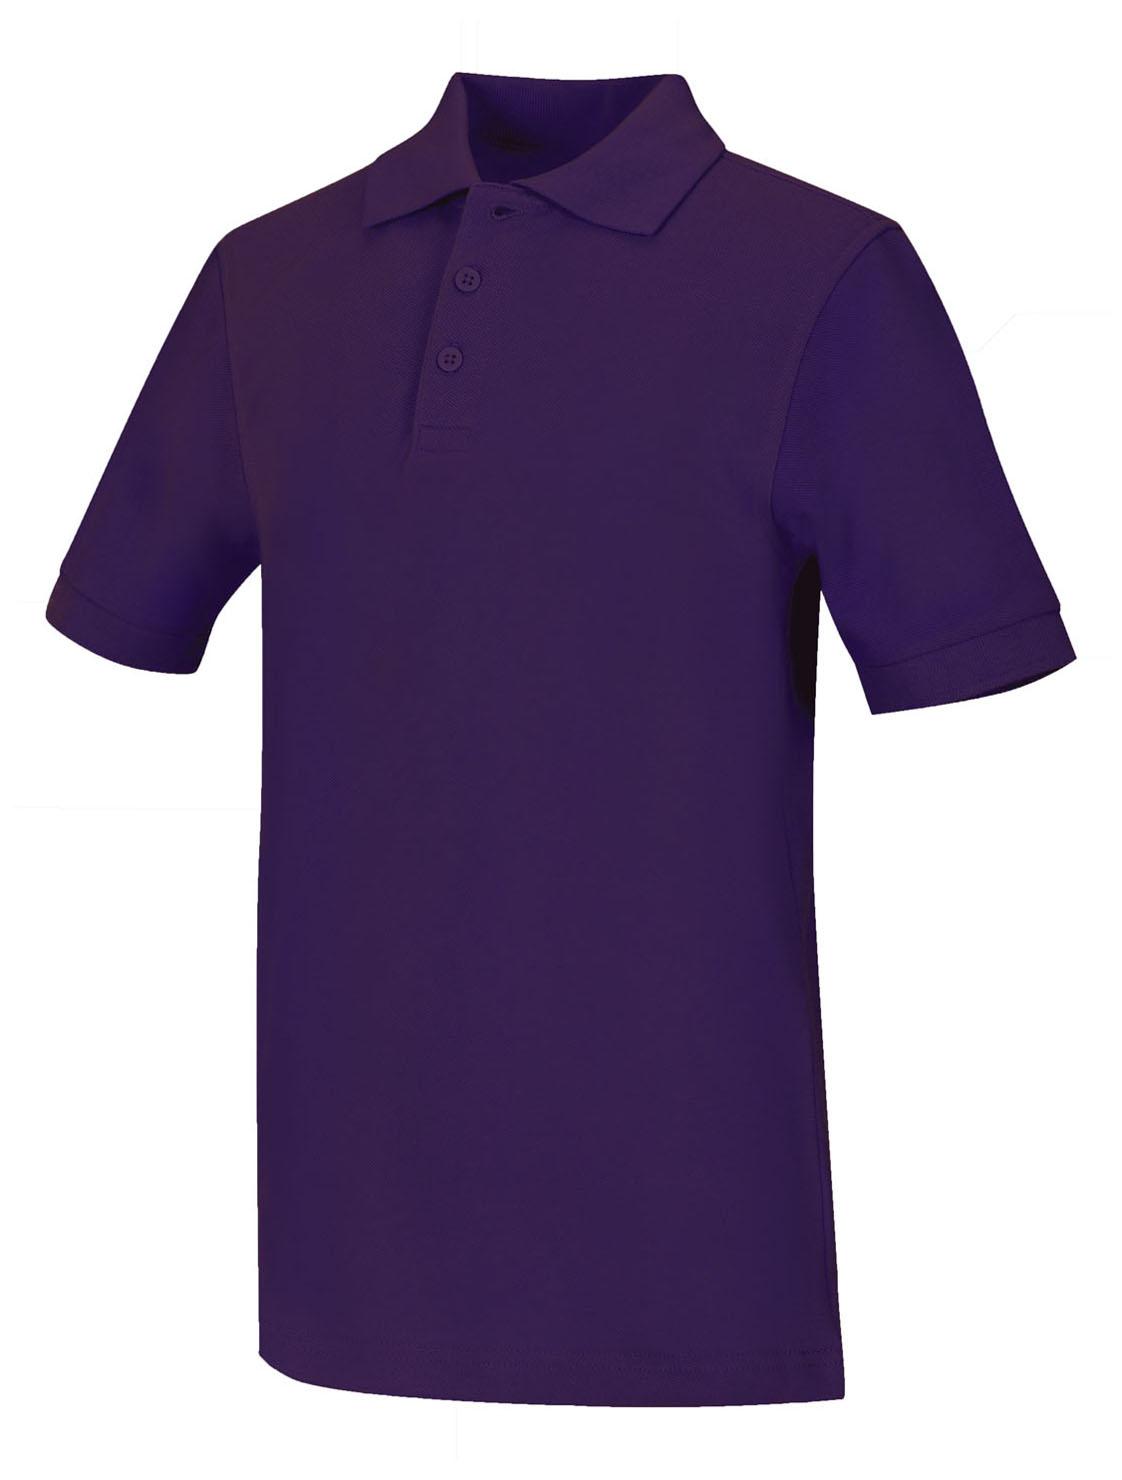 Classroom Big Boys Uniform Pique Short Sleeve Polo,Dark Navy,X-Small